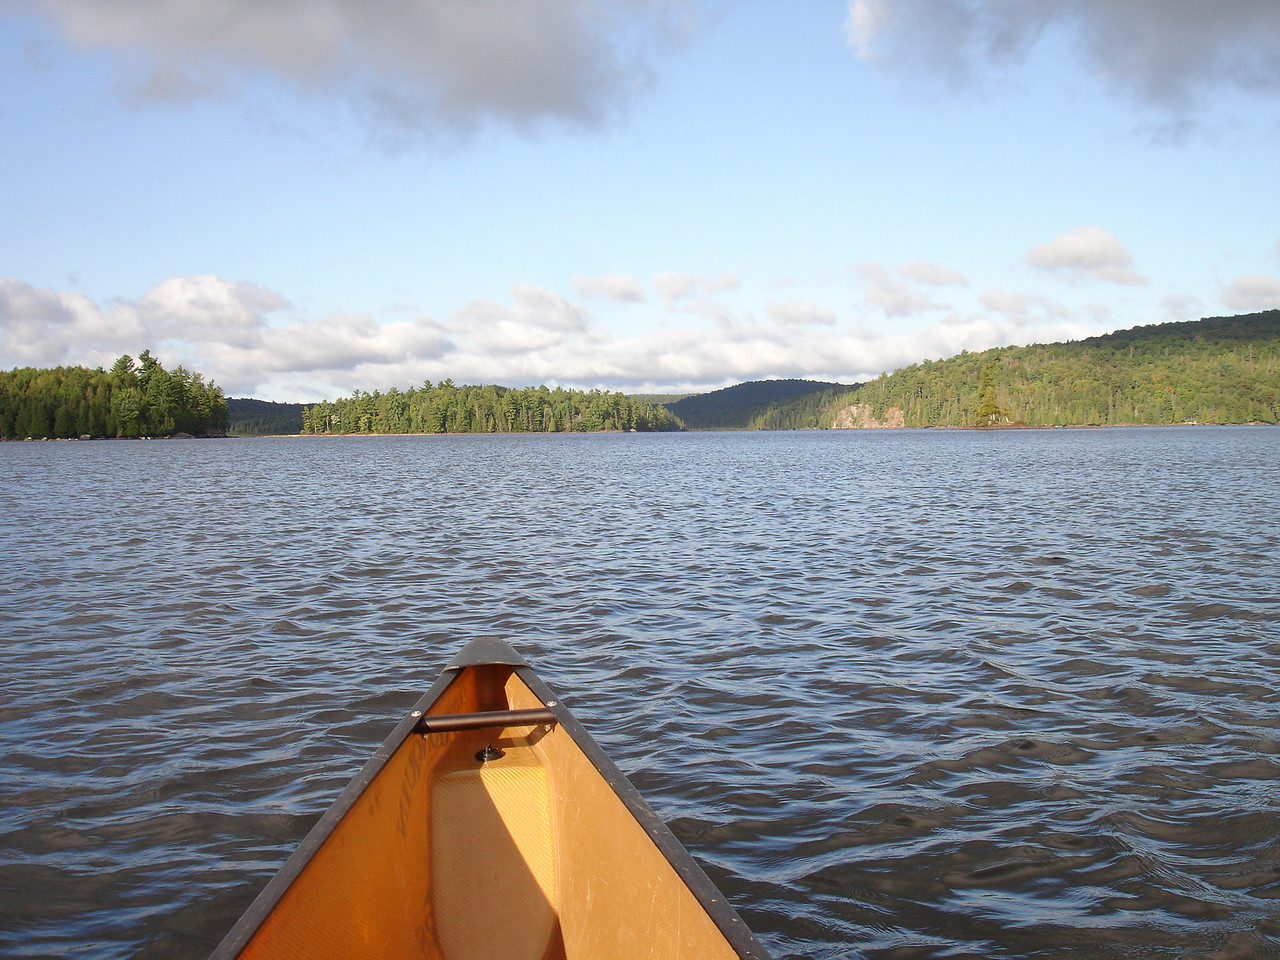 Next morning, heading south past those islands toward Pen Lake